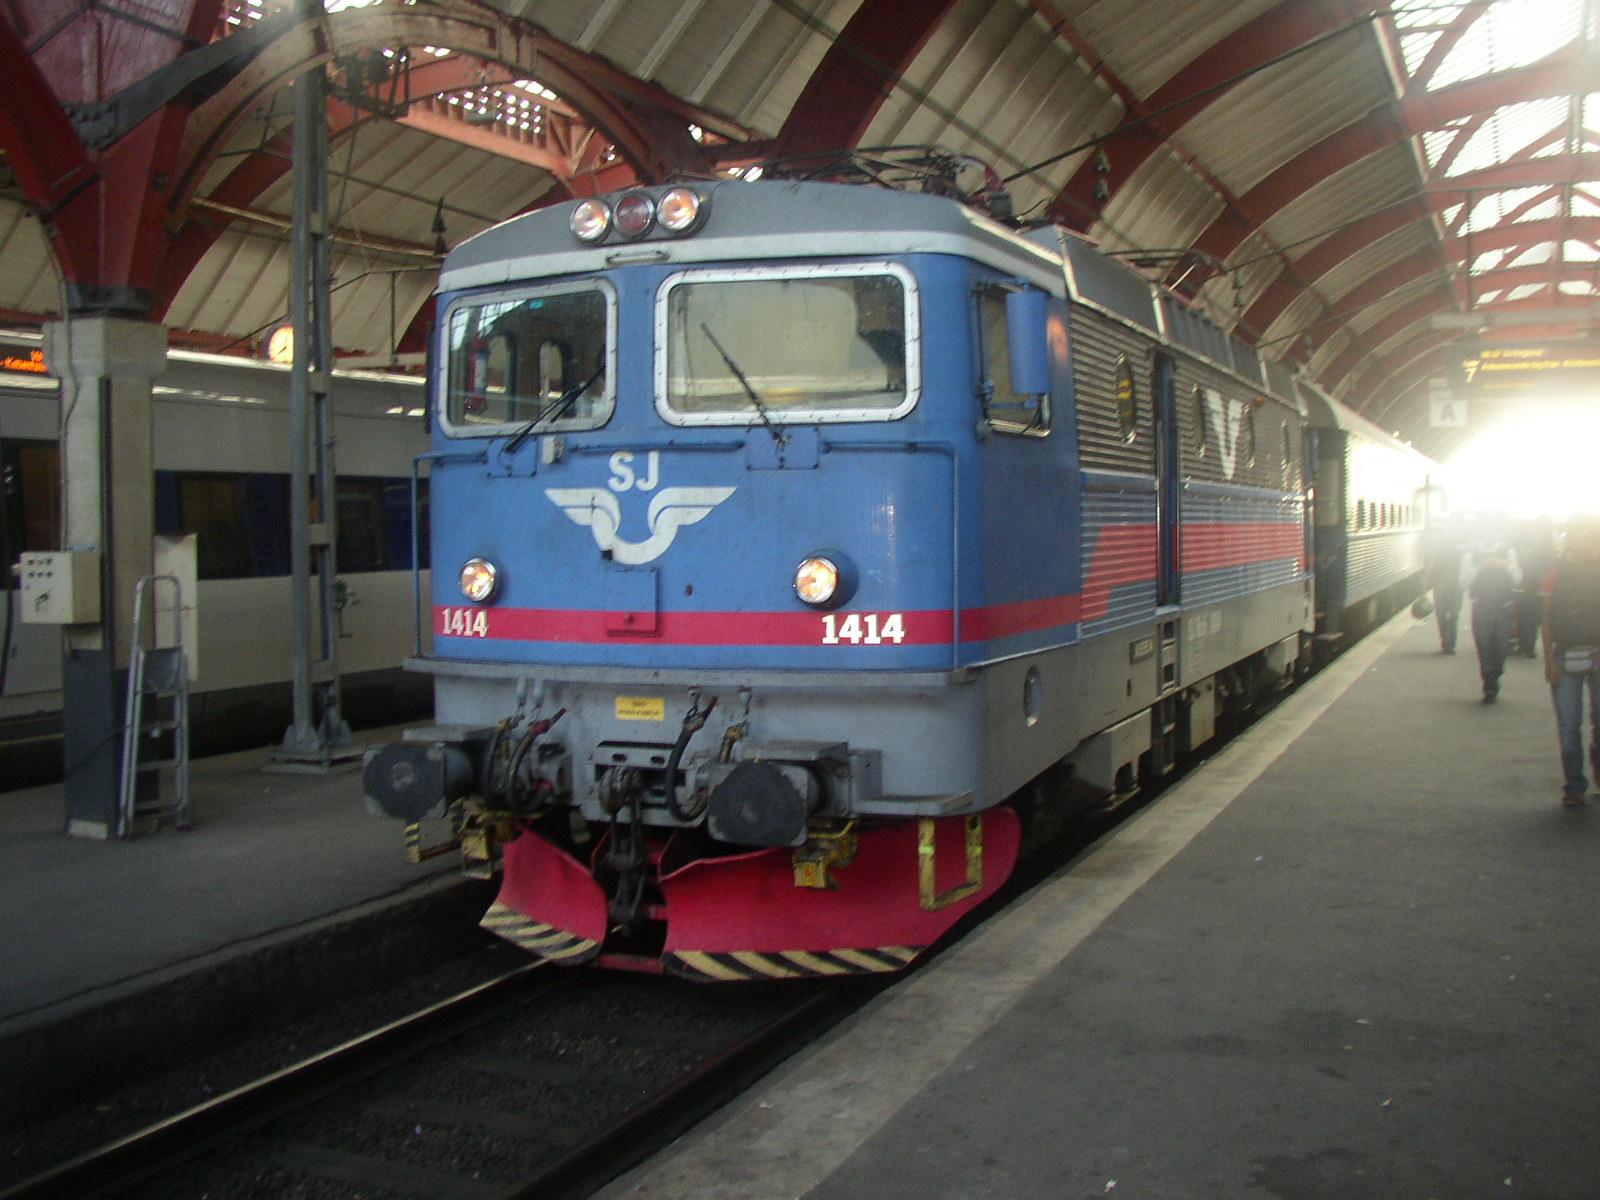 File:Locomotive-1414-SJ.jpg